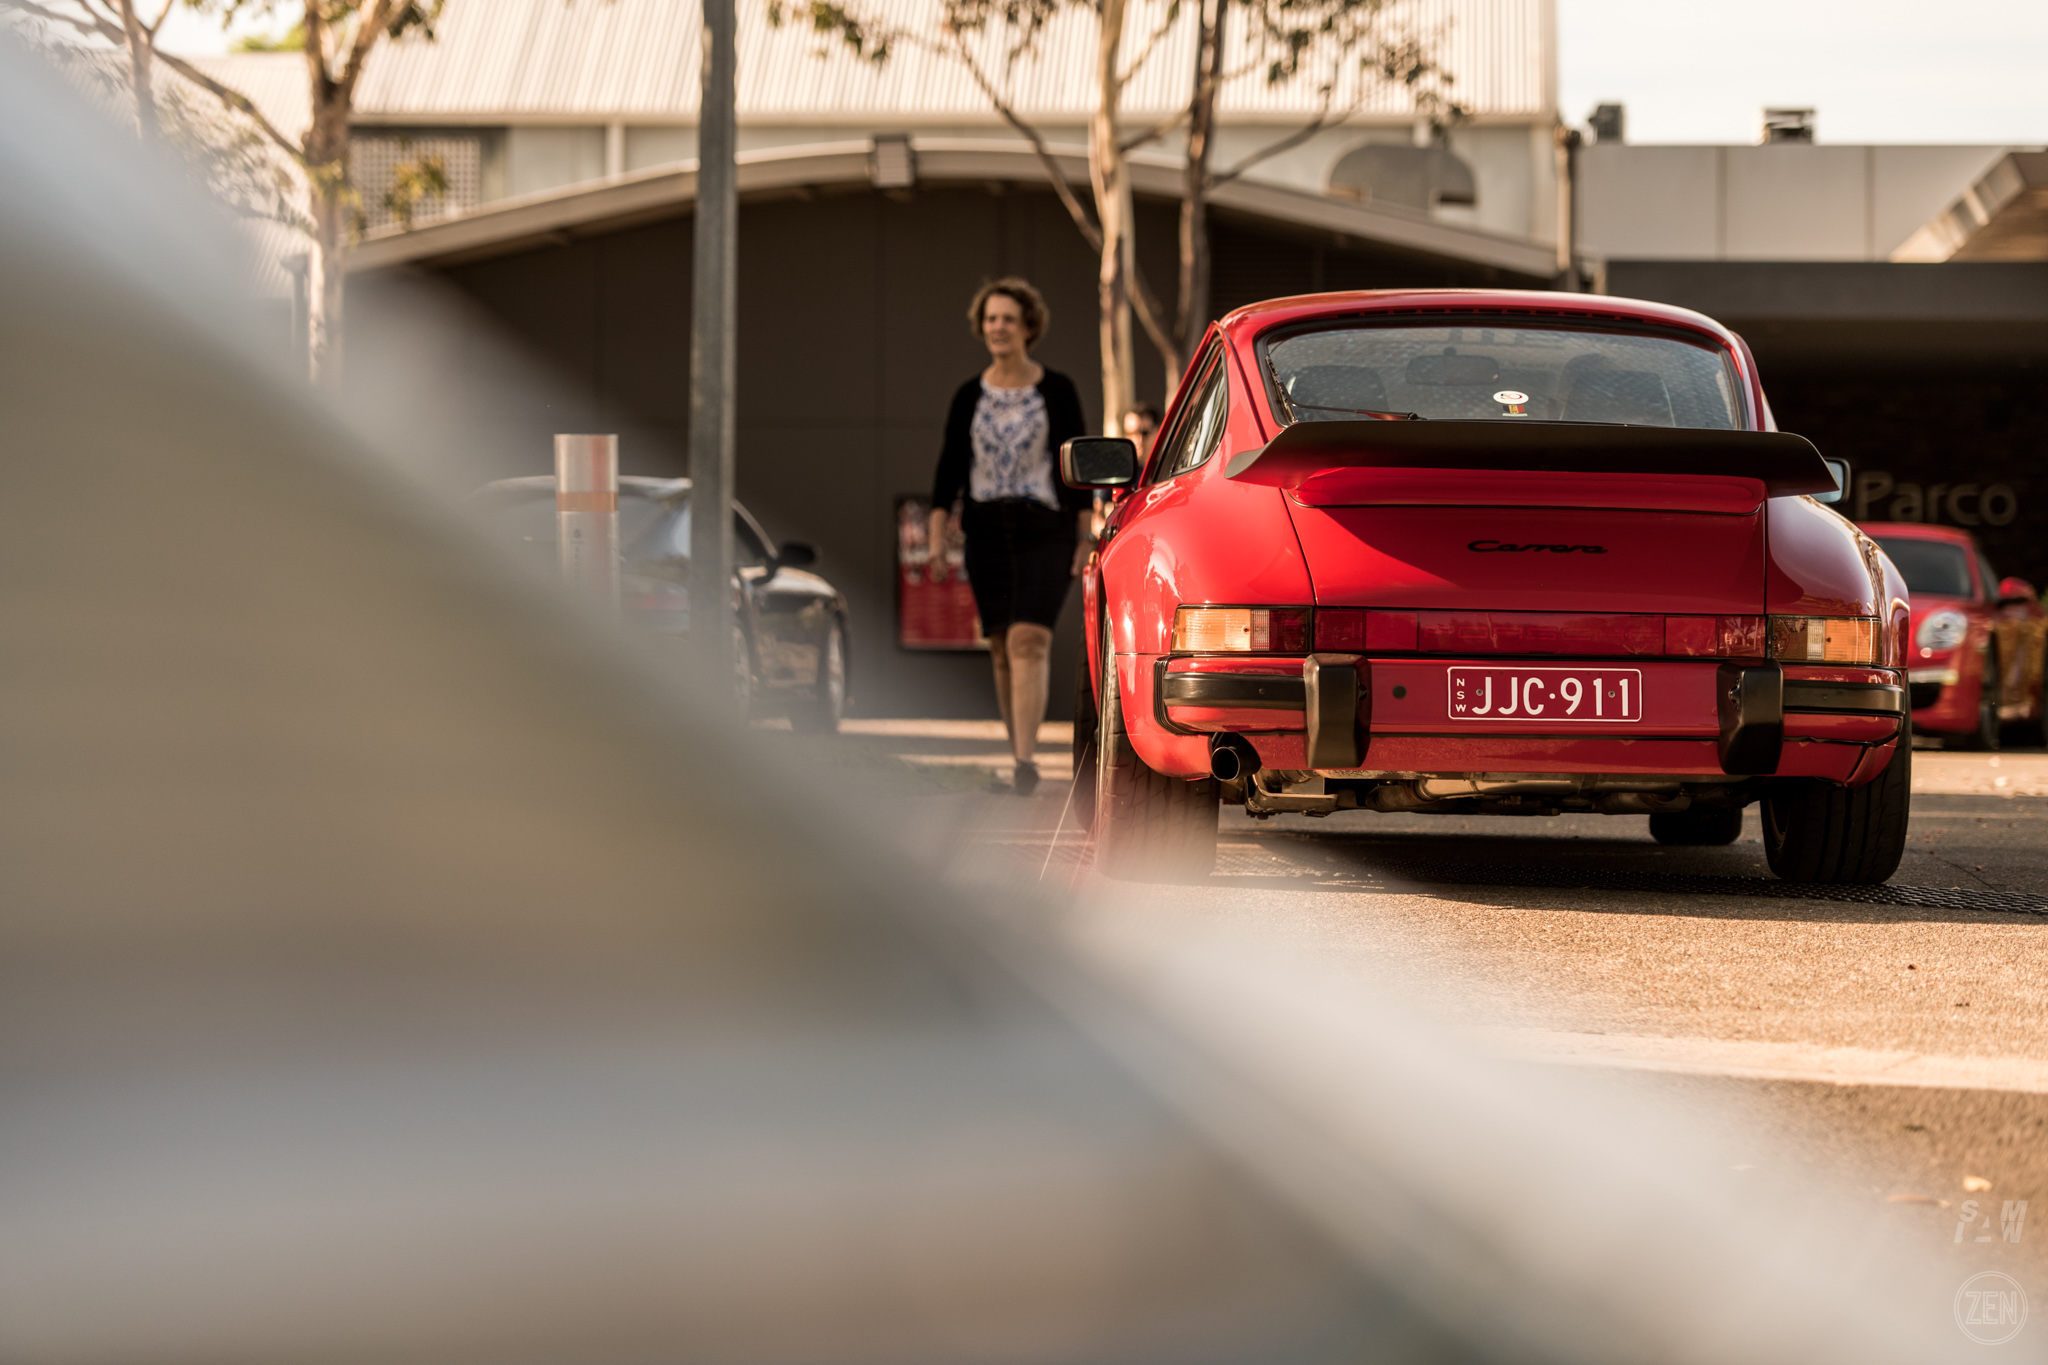 2019-10-27 - Autohaus Porsches & Coffee 123